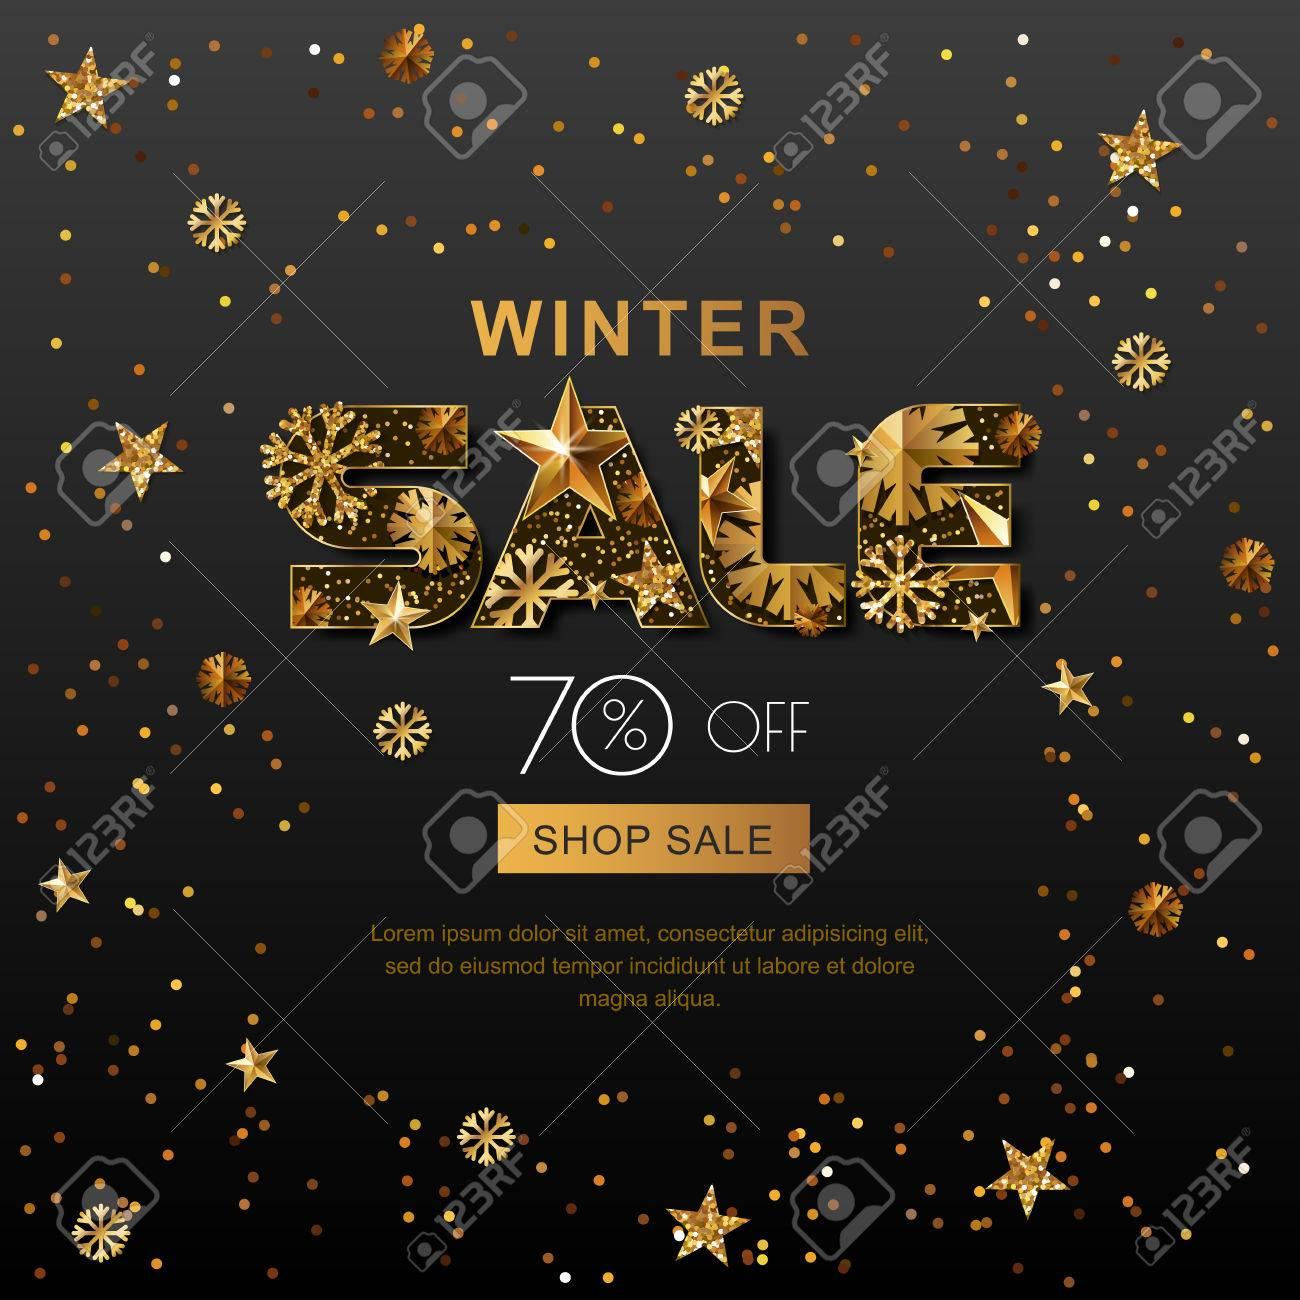 Winter Sale Banners Cartoon Banners